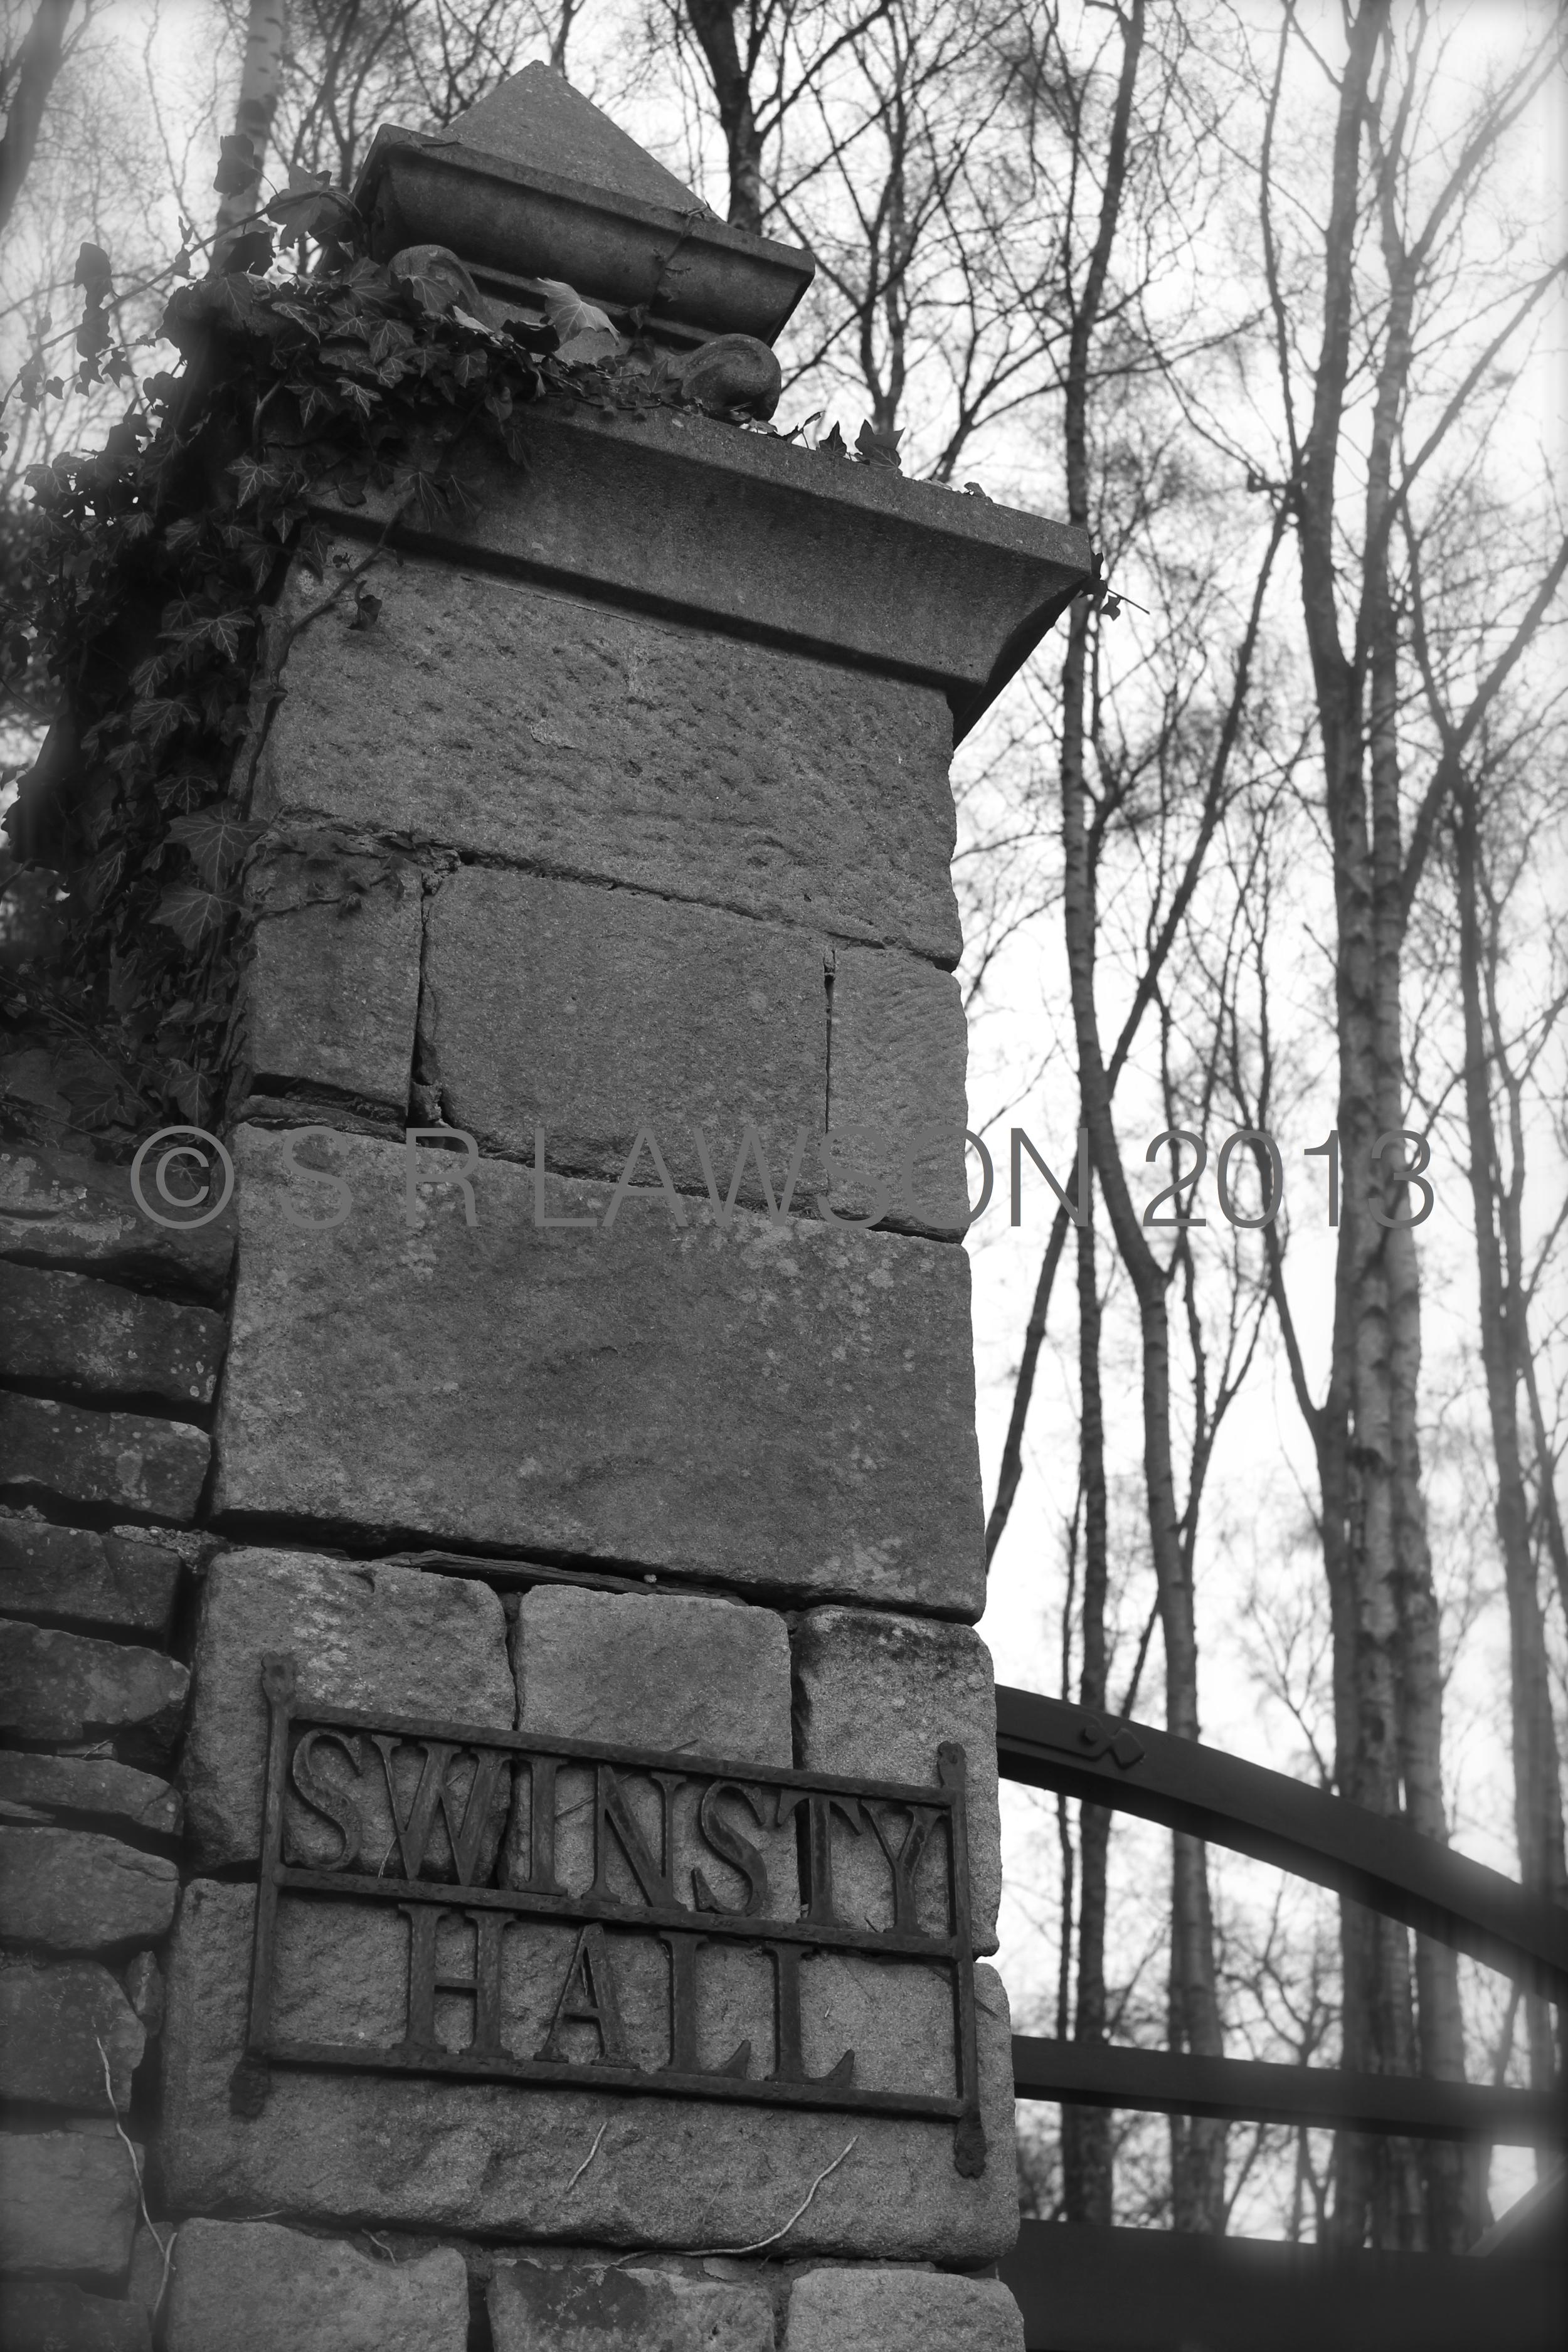 Swinsty Hall Gatepost